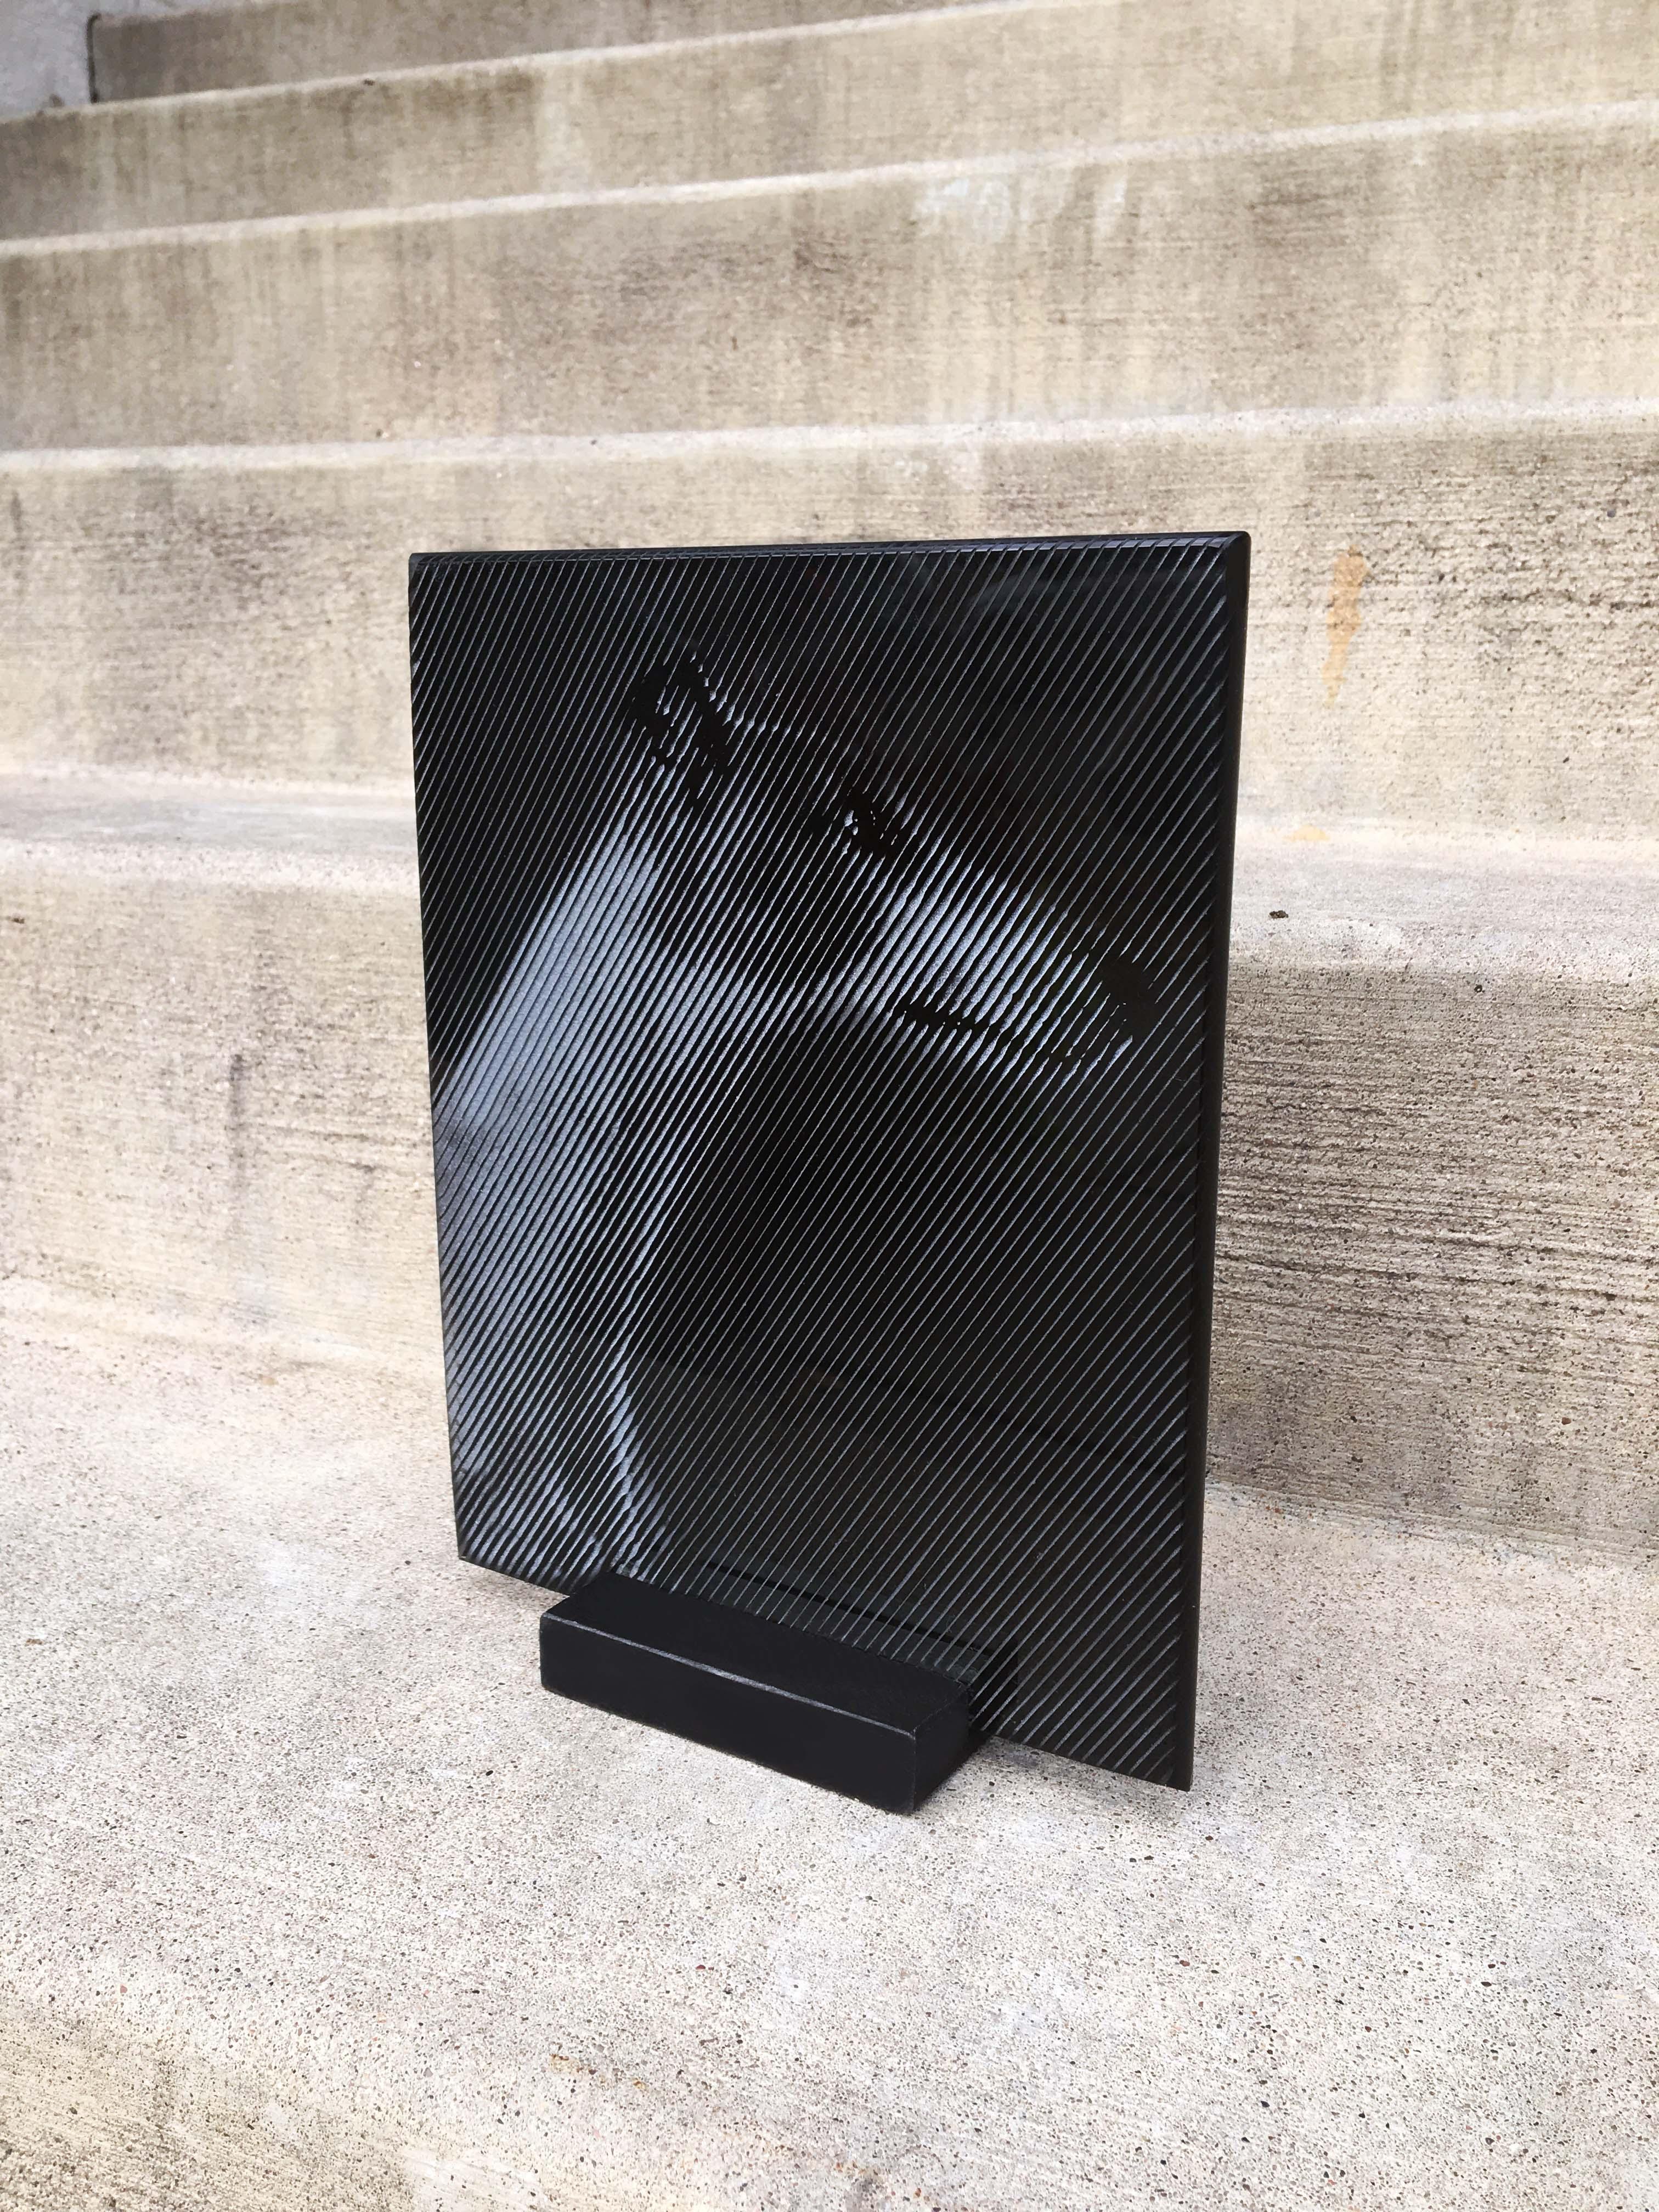 dog on glass